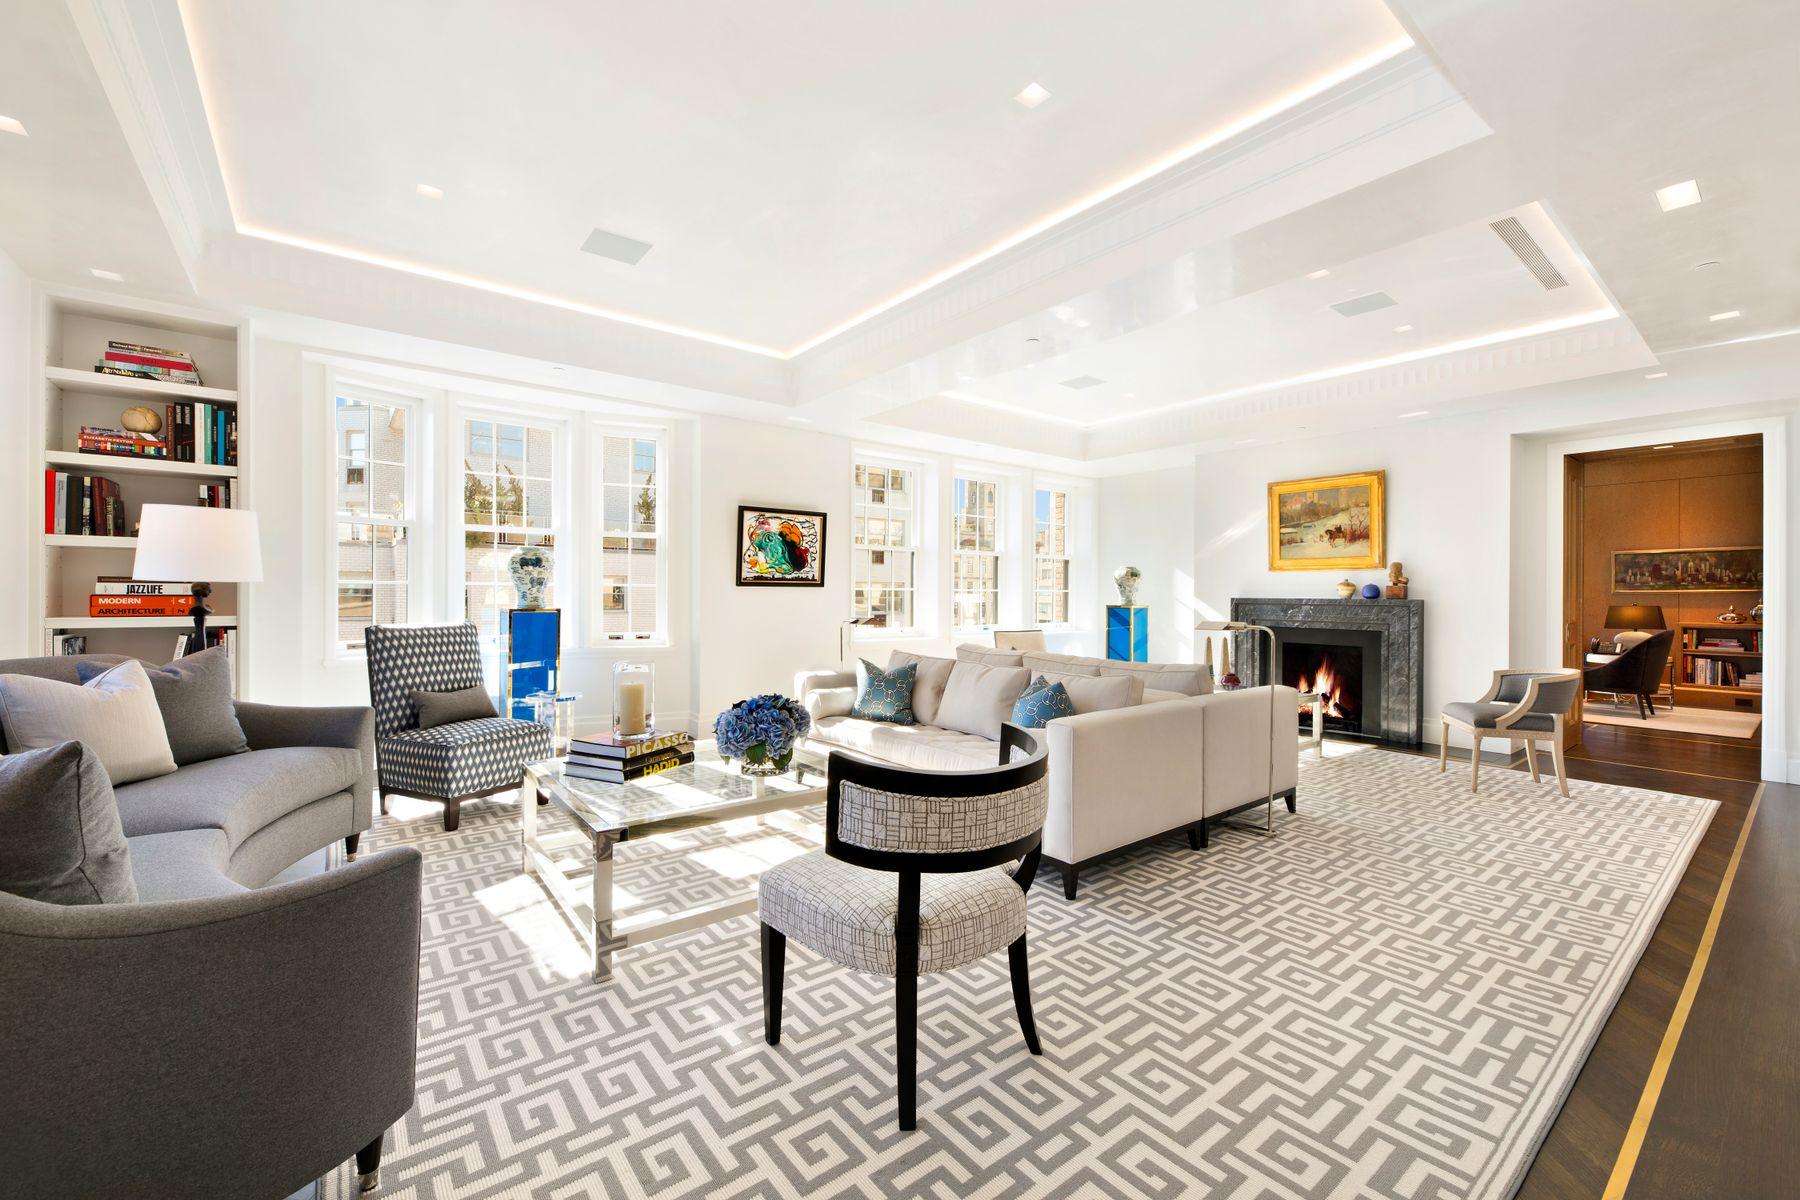 Condominium for Sale at Prewar Penthouse Condominium 11 East 68th Street Penthouse East, New York, New York 10065 United States